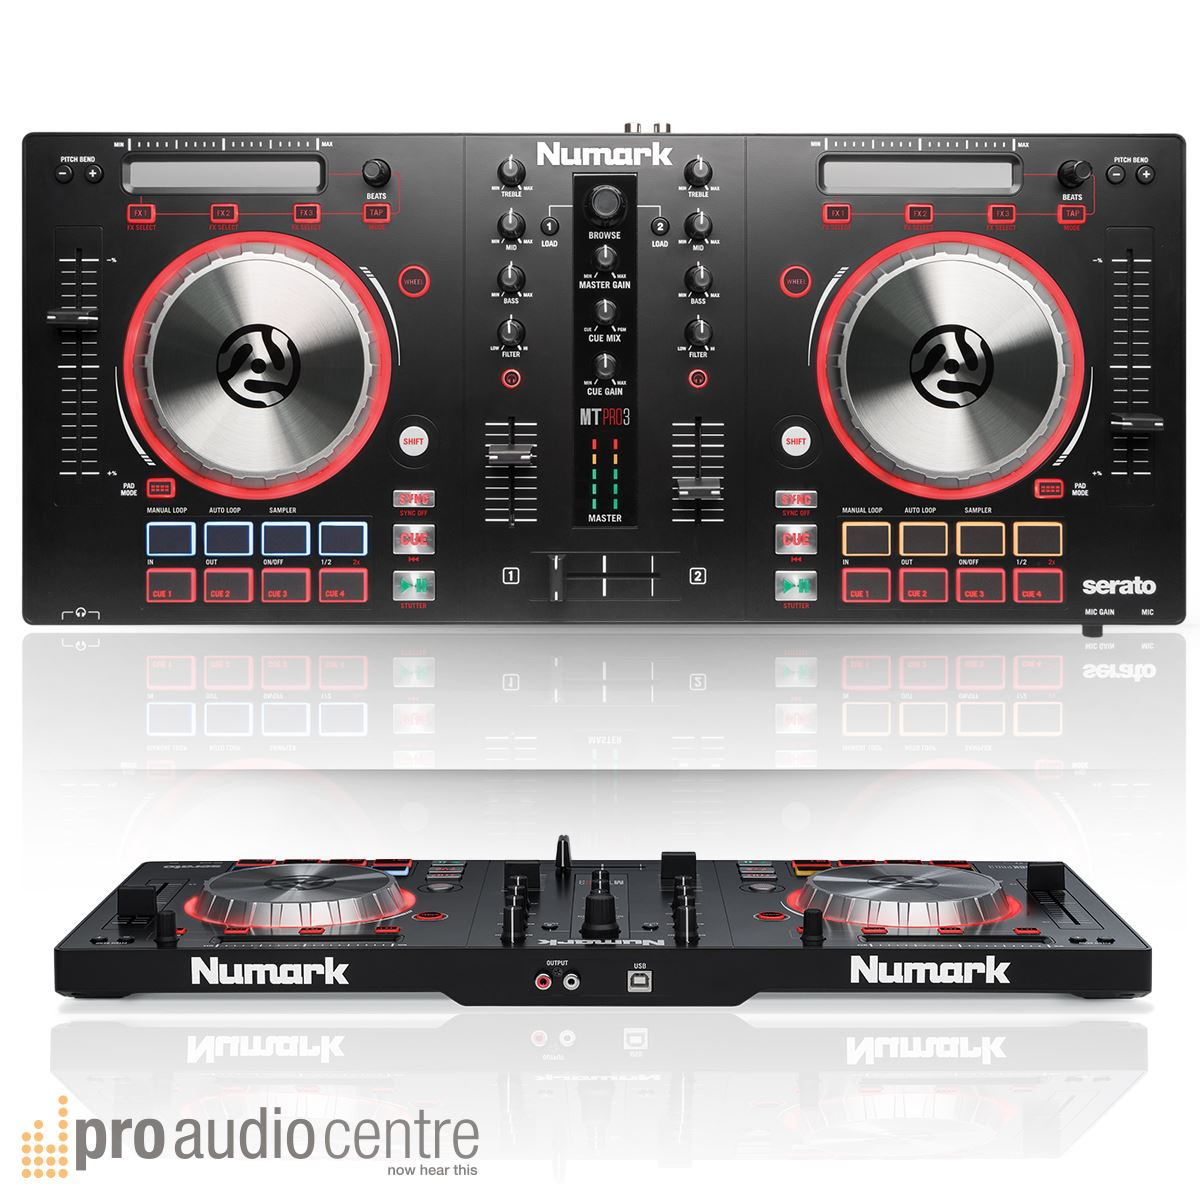 Numark Mixtrack Pro 3 Digital USB DJ Controller with Laptop Stand and Headphones